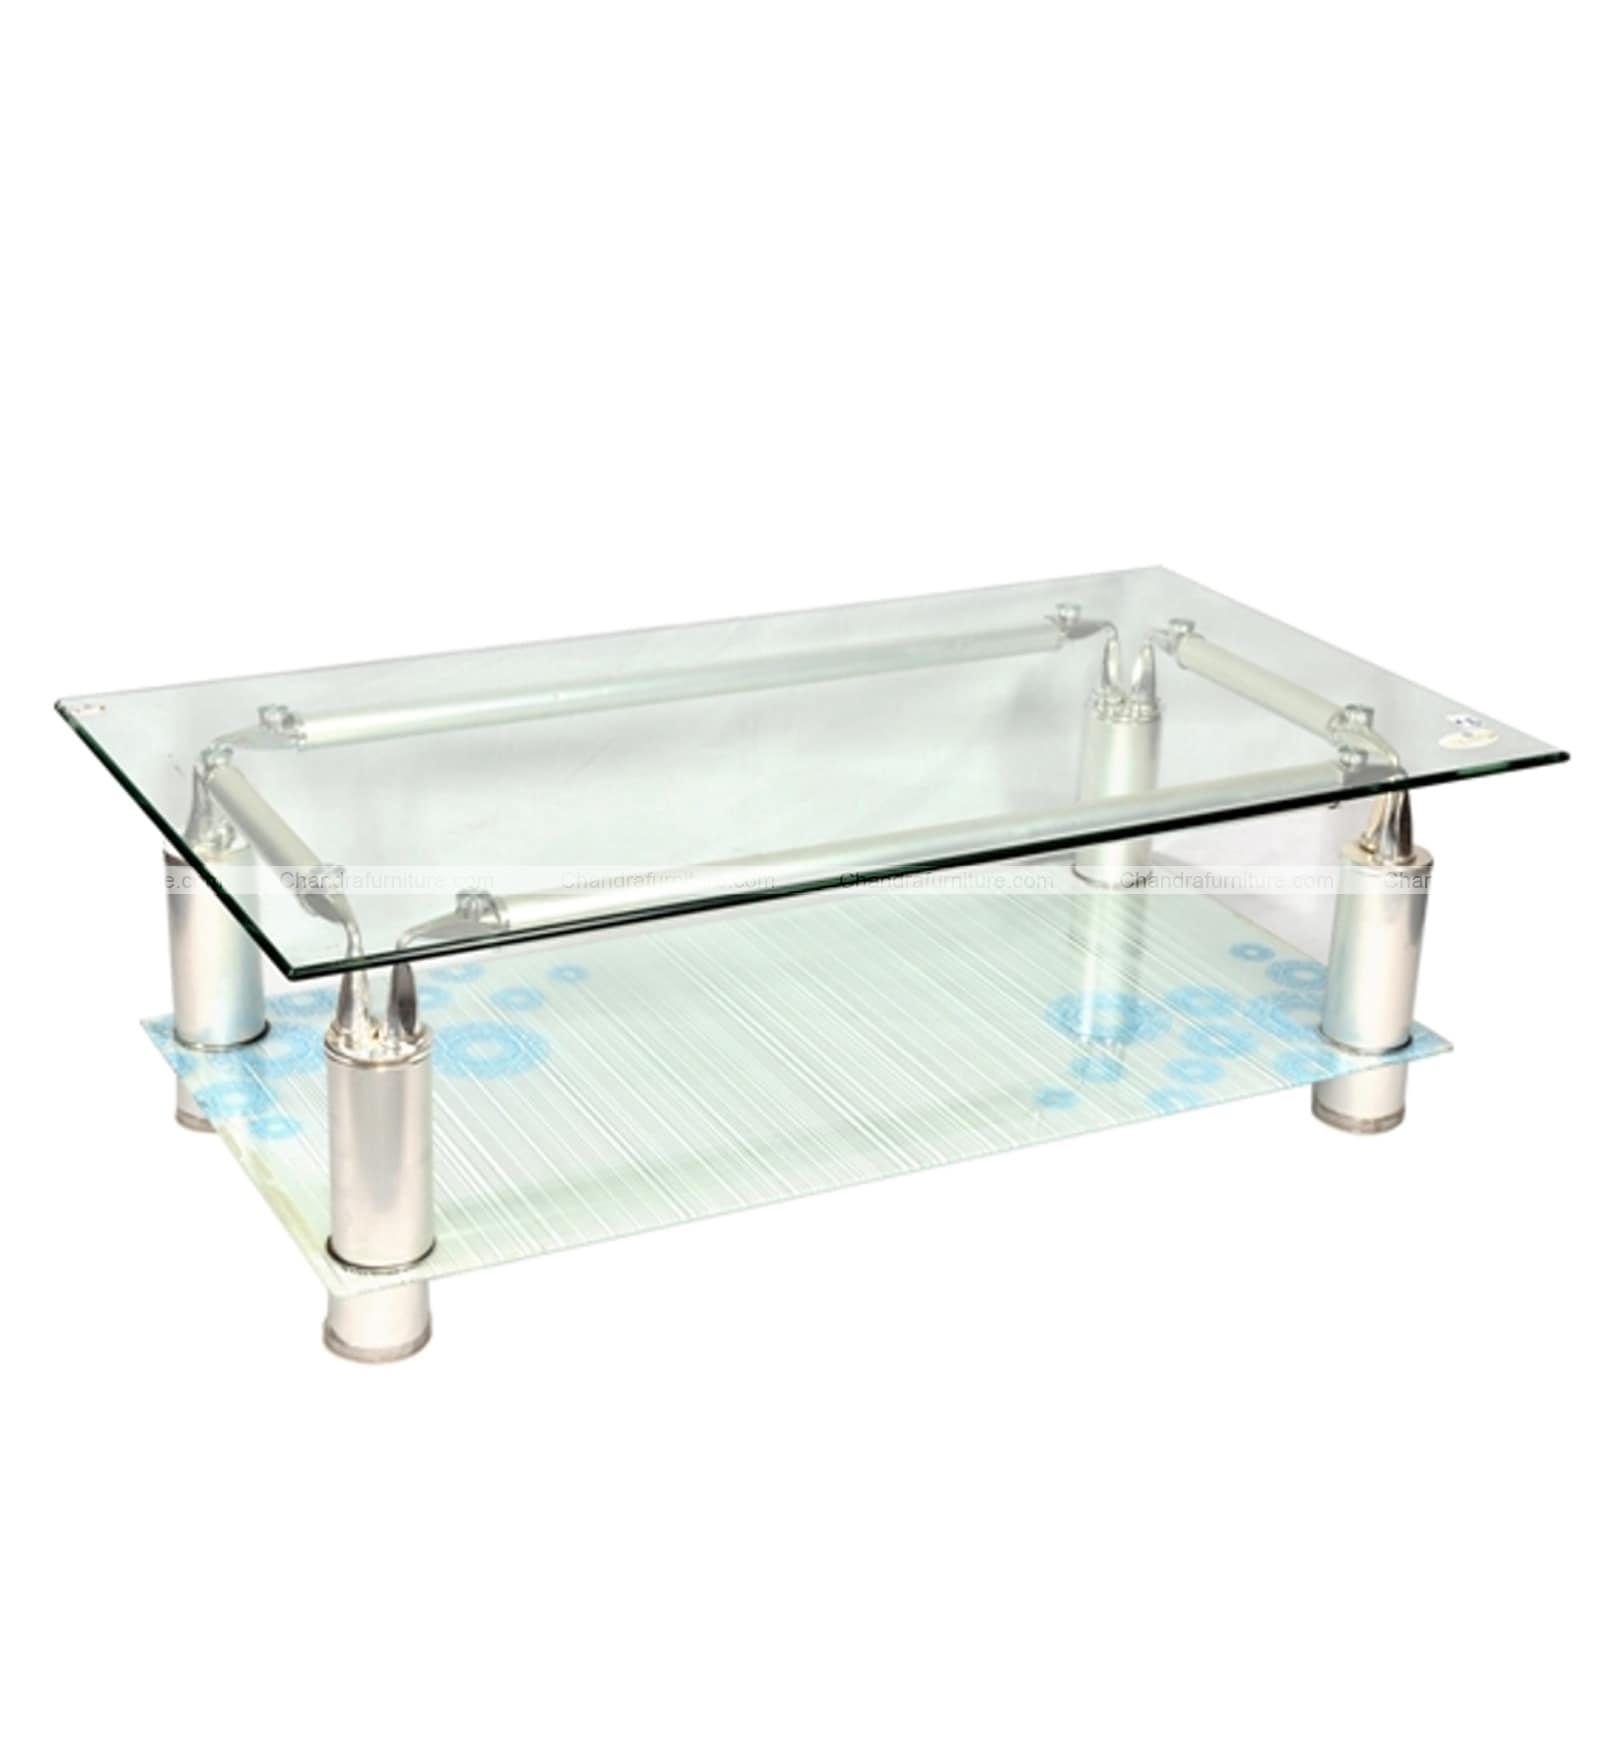 CHANDRA FURNITURE CENTER TABLE  810